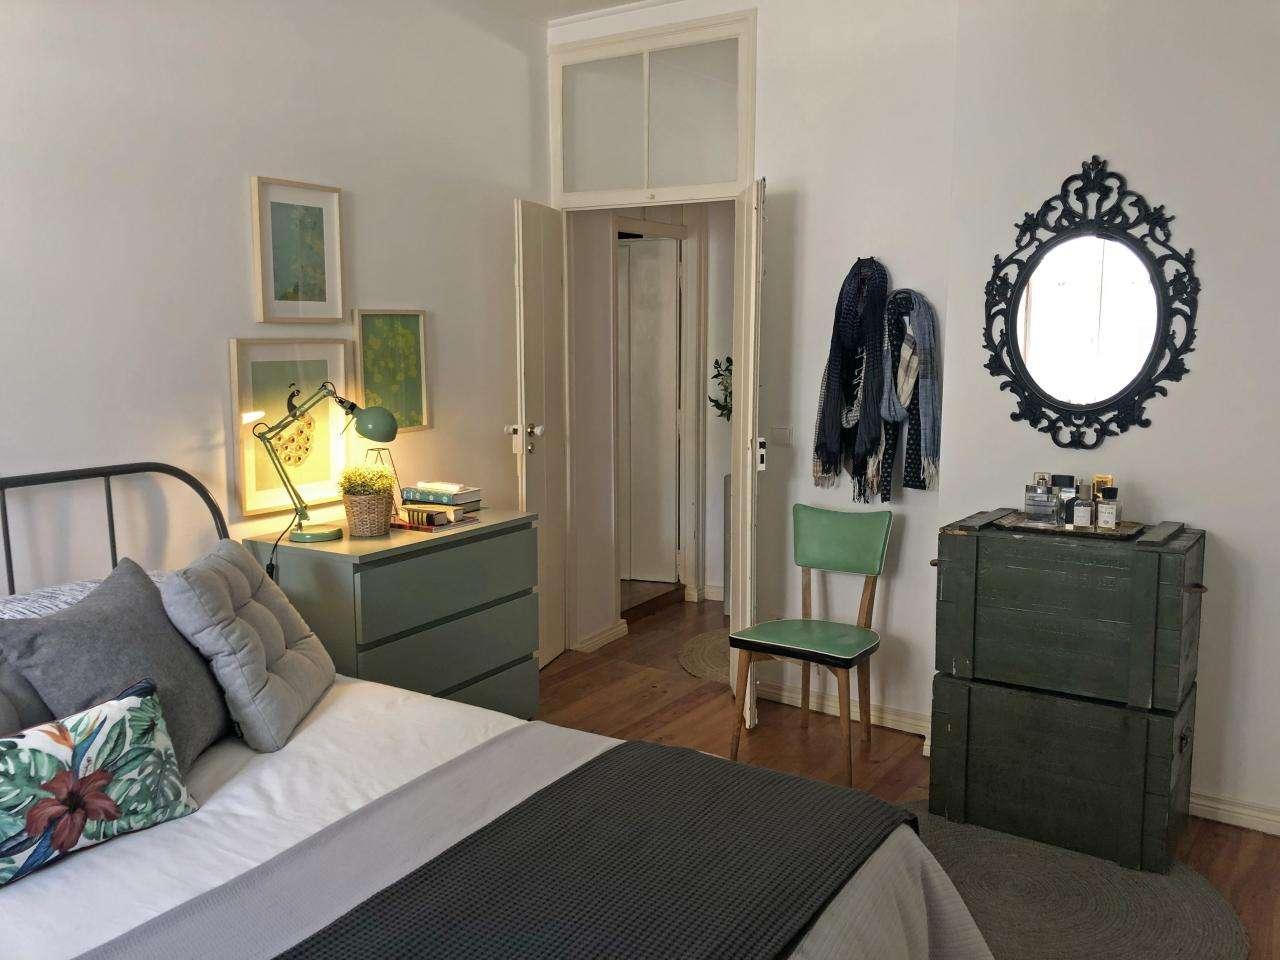 Apartamento para comprar, Misericórdia, Lisboa - Foto 24